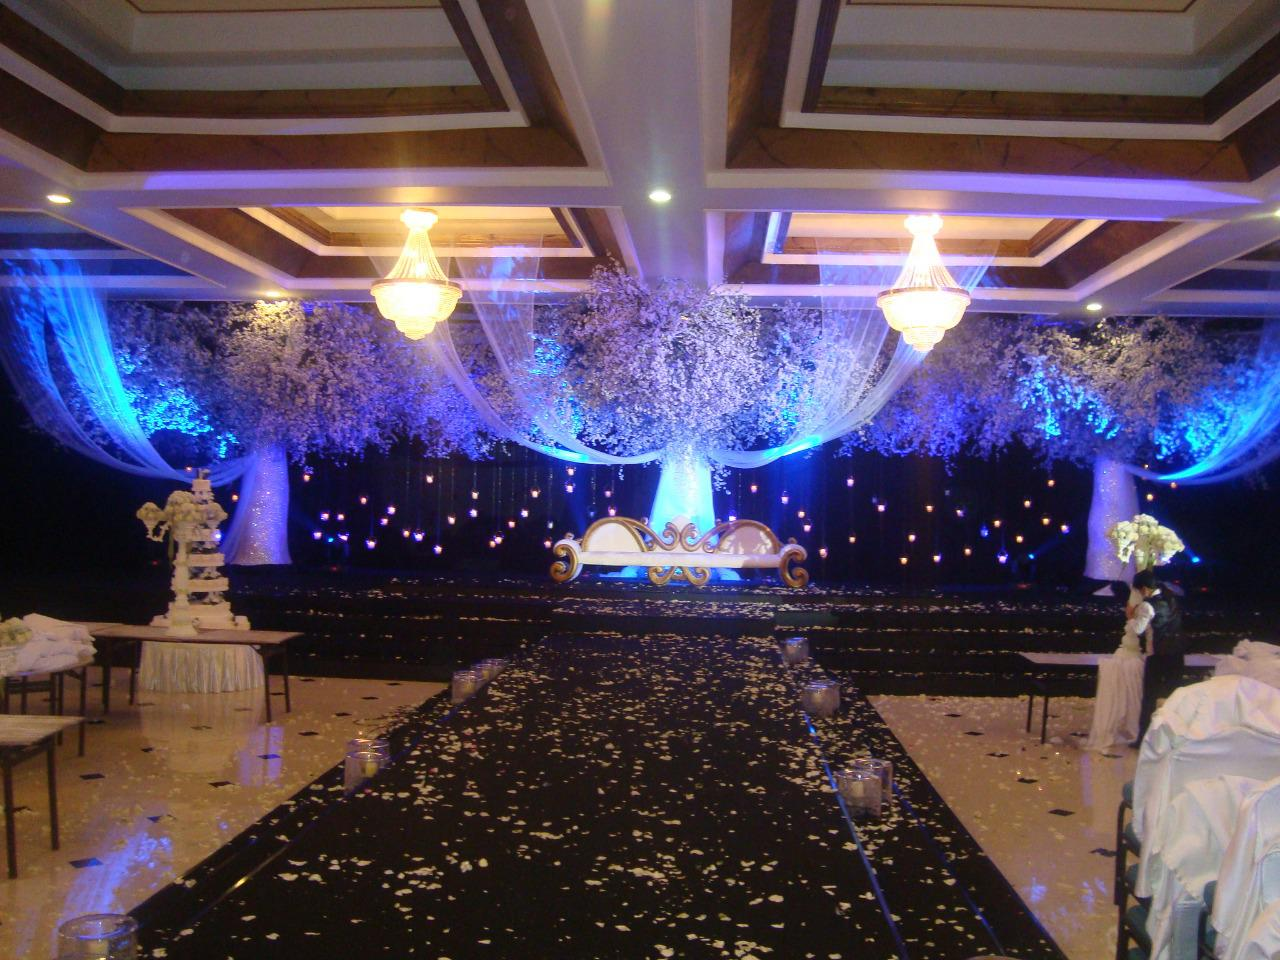 https://www.qar.ae/assets/uploads/gallery/bride-groom/5.jpeg